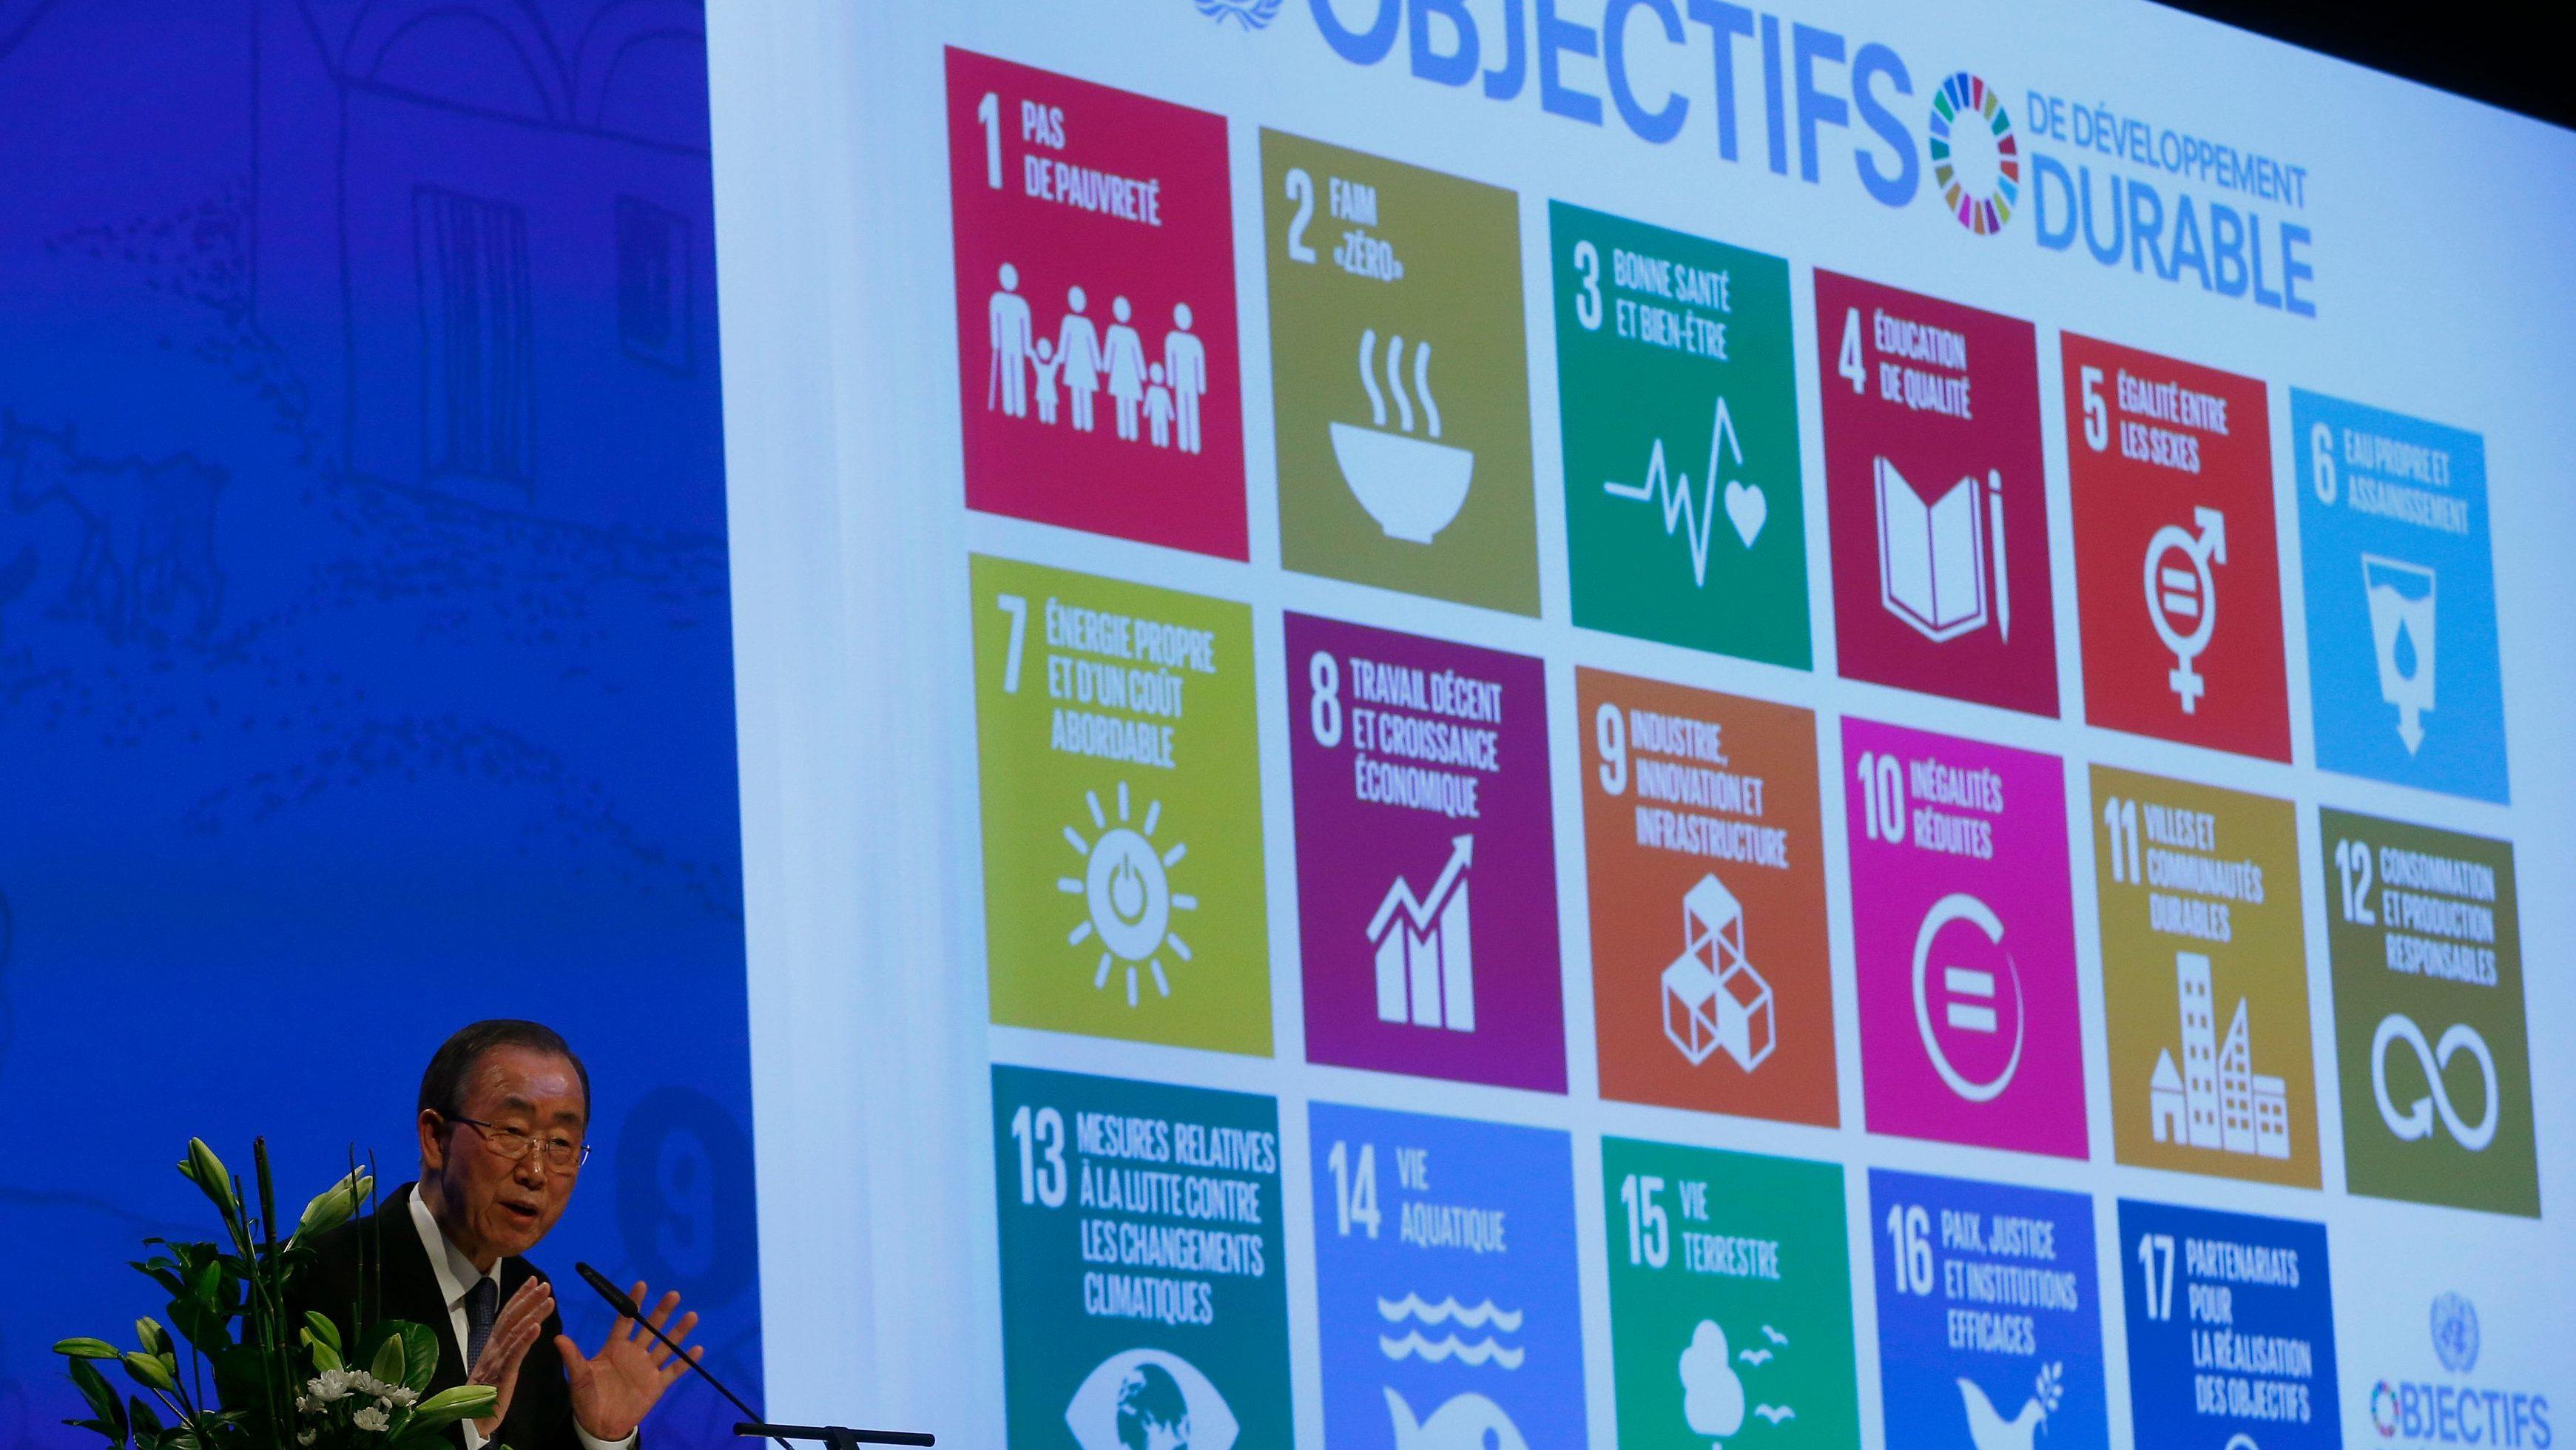 The UN's Sustainable Development Goals SDGs are undermining democracy — Quartz Africa